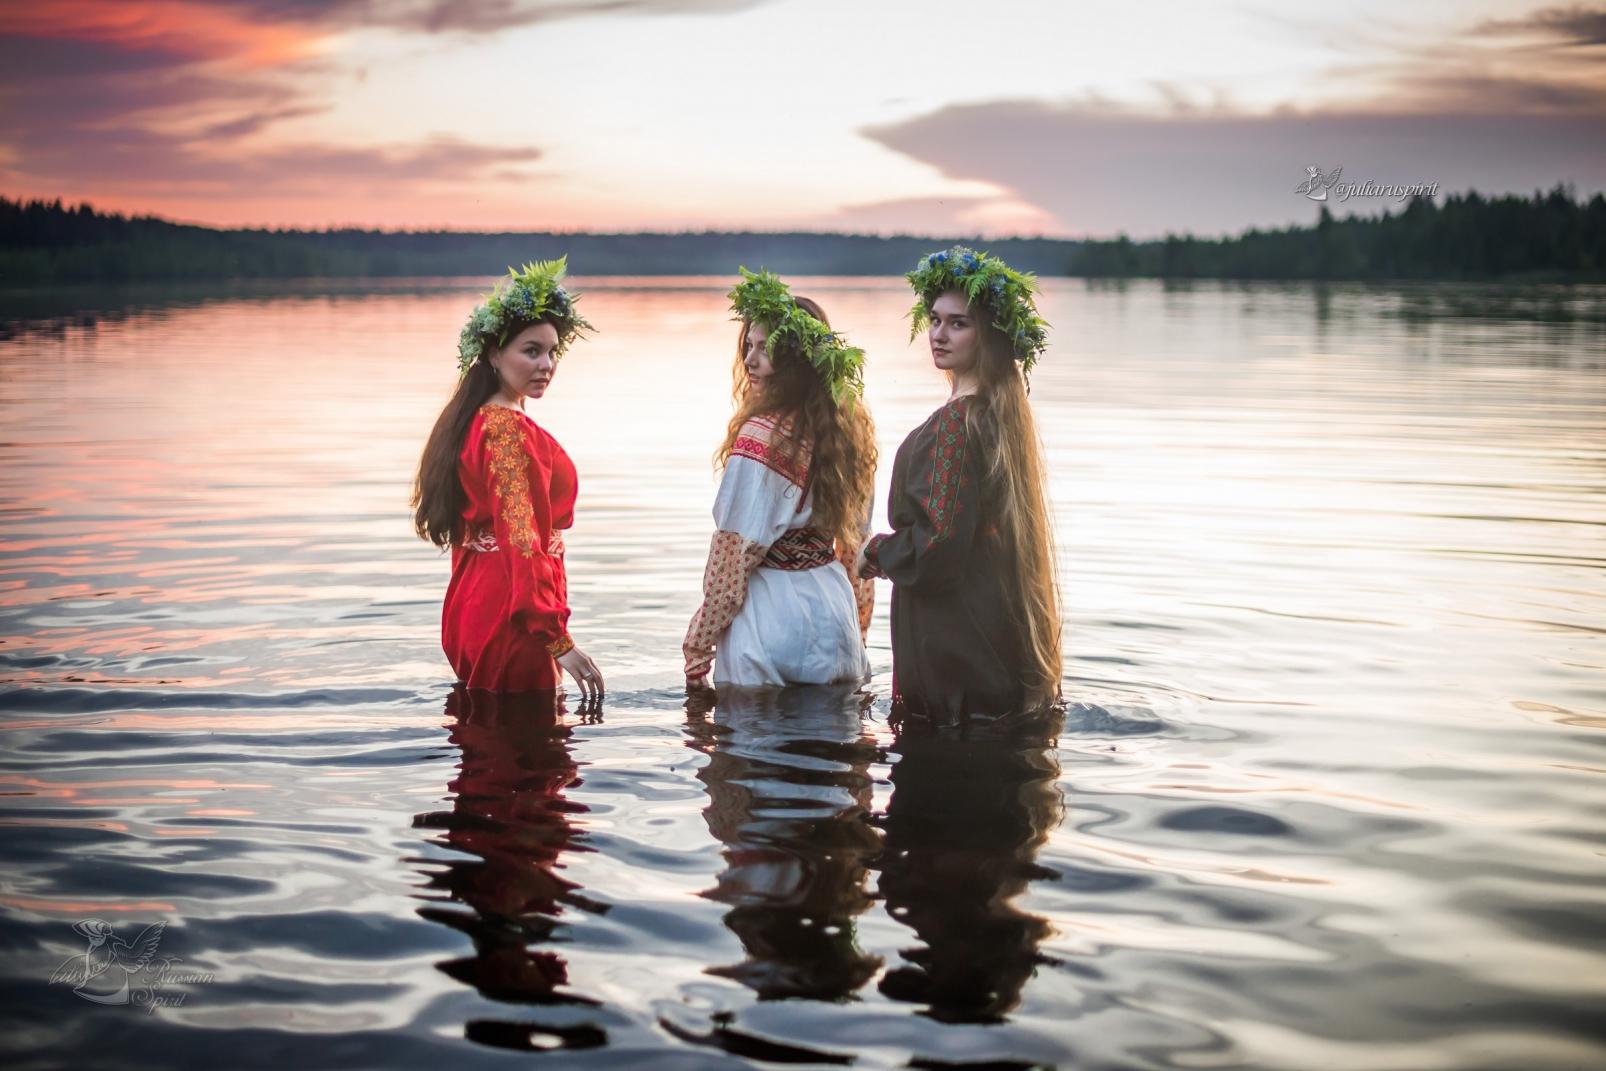 Девушки в славянских платьях в воде на закате Купало